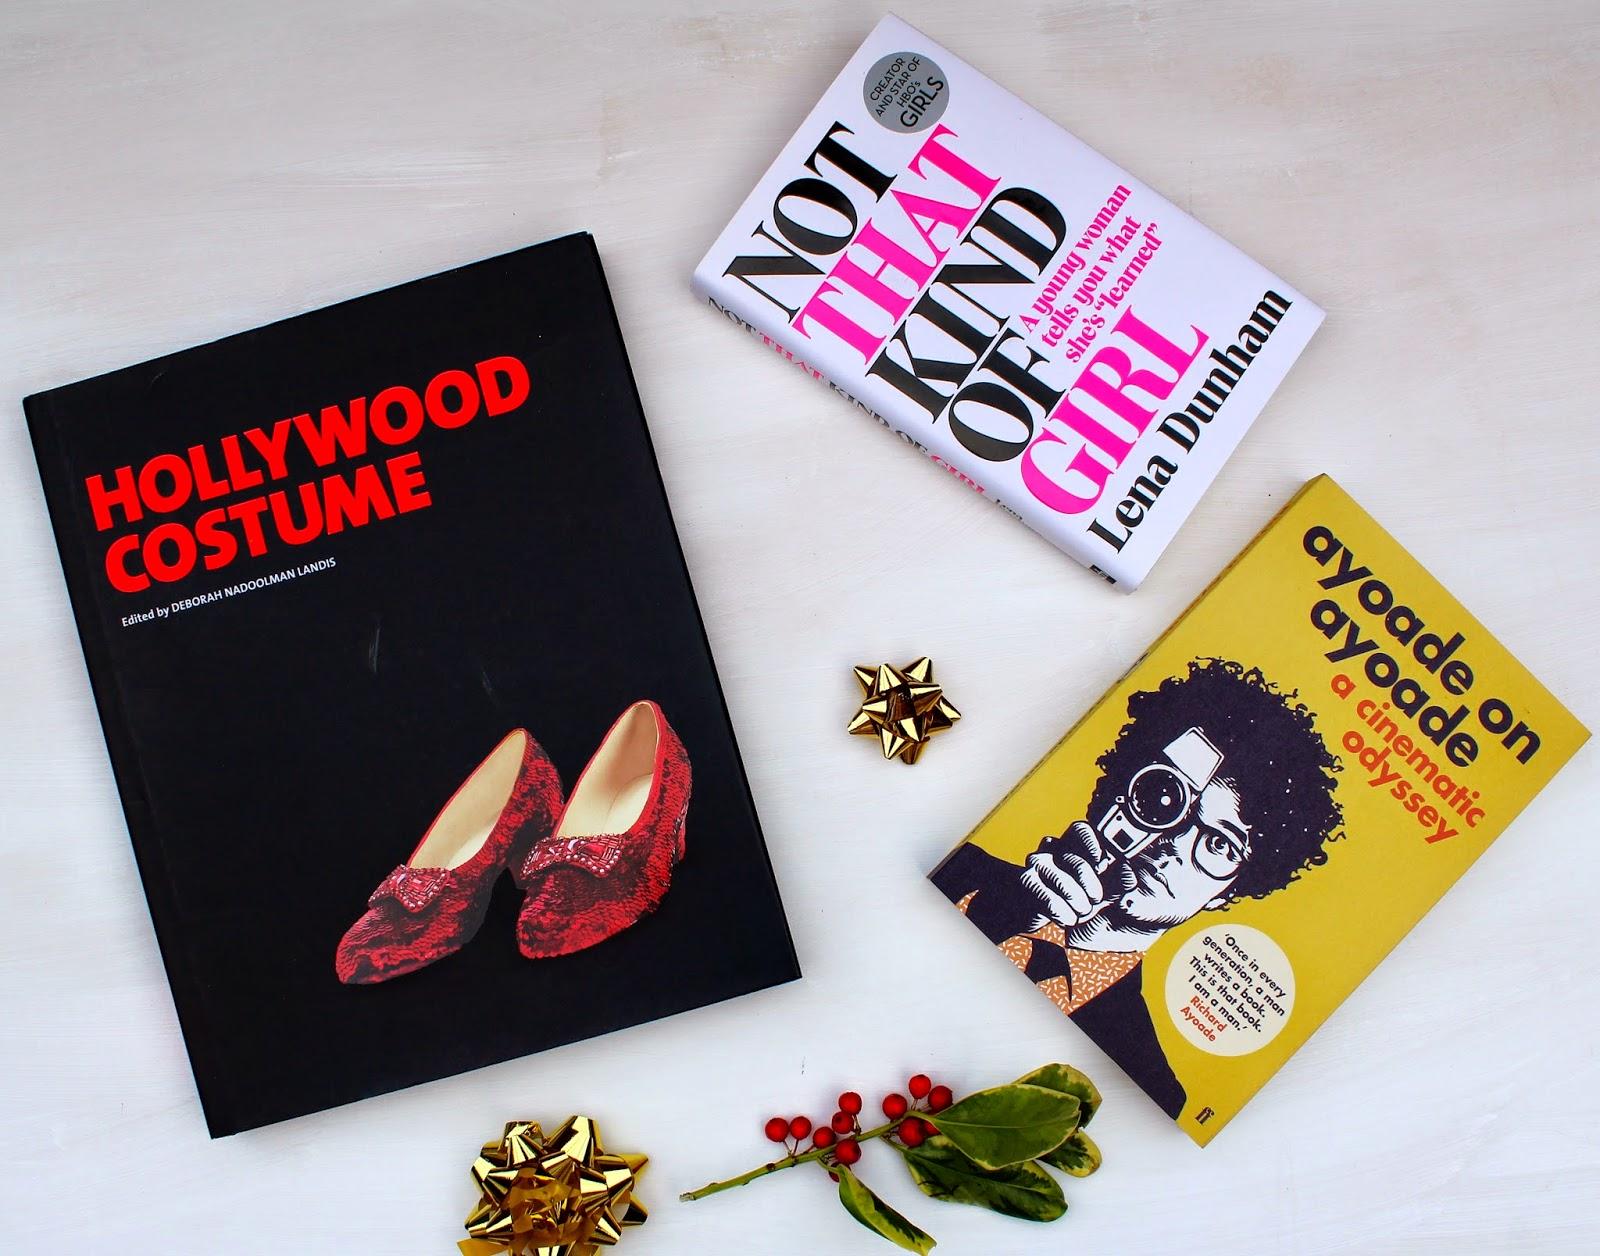 fbloggers, fblogger, fashionblogger, fashionbloggers, whatibought, christmas, christmasgifts, whatigotforchristmas, christmashaul, gifthaul, richardayoade, lenadunham, hollywoodcostume, marcjacobs, next, jellybelly, ringholder, robertsradio, nivea, primark, newlook